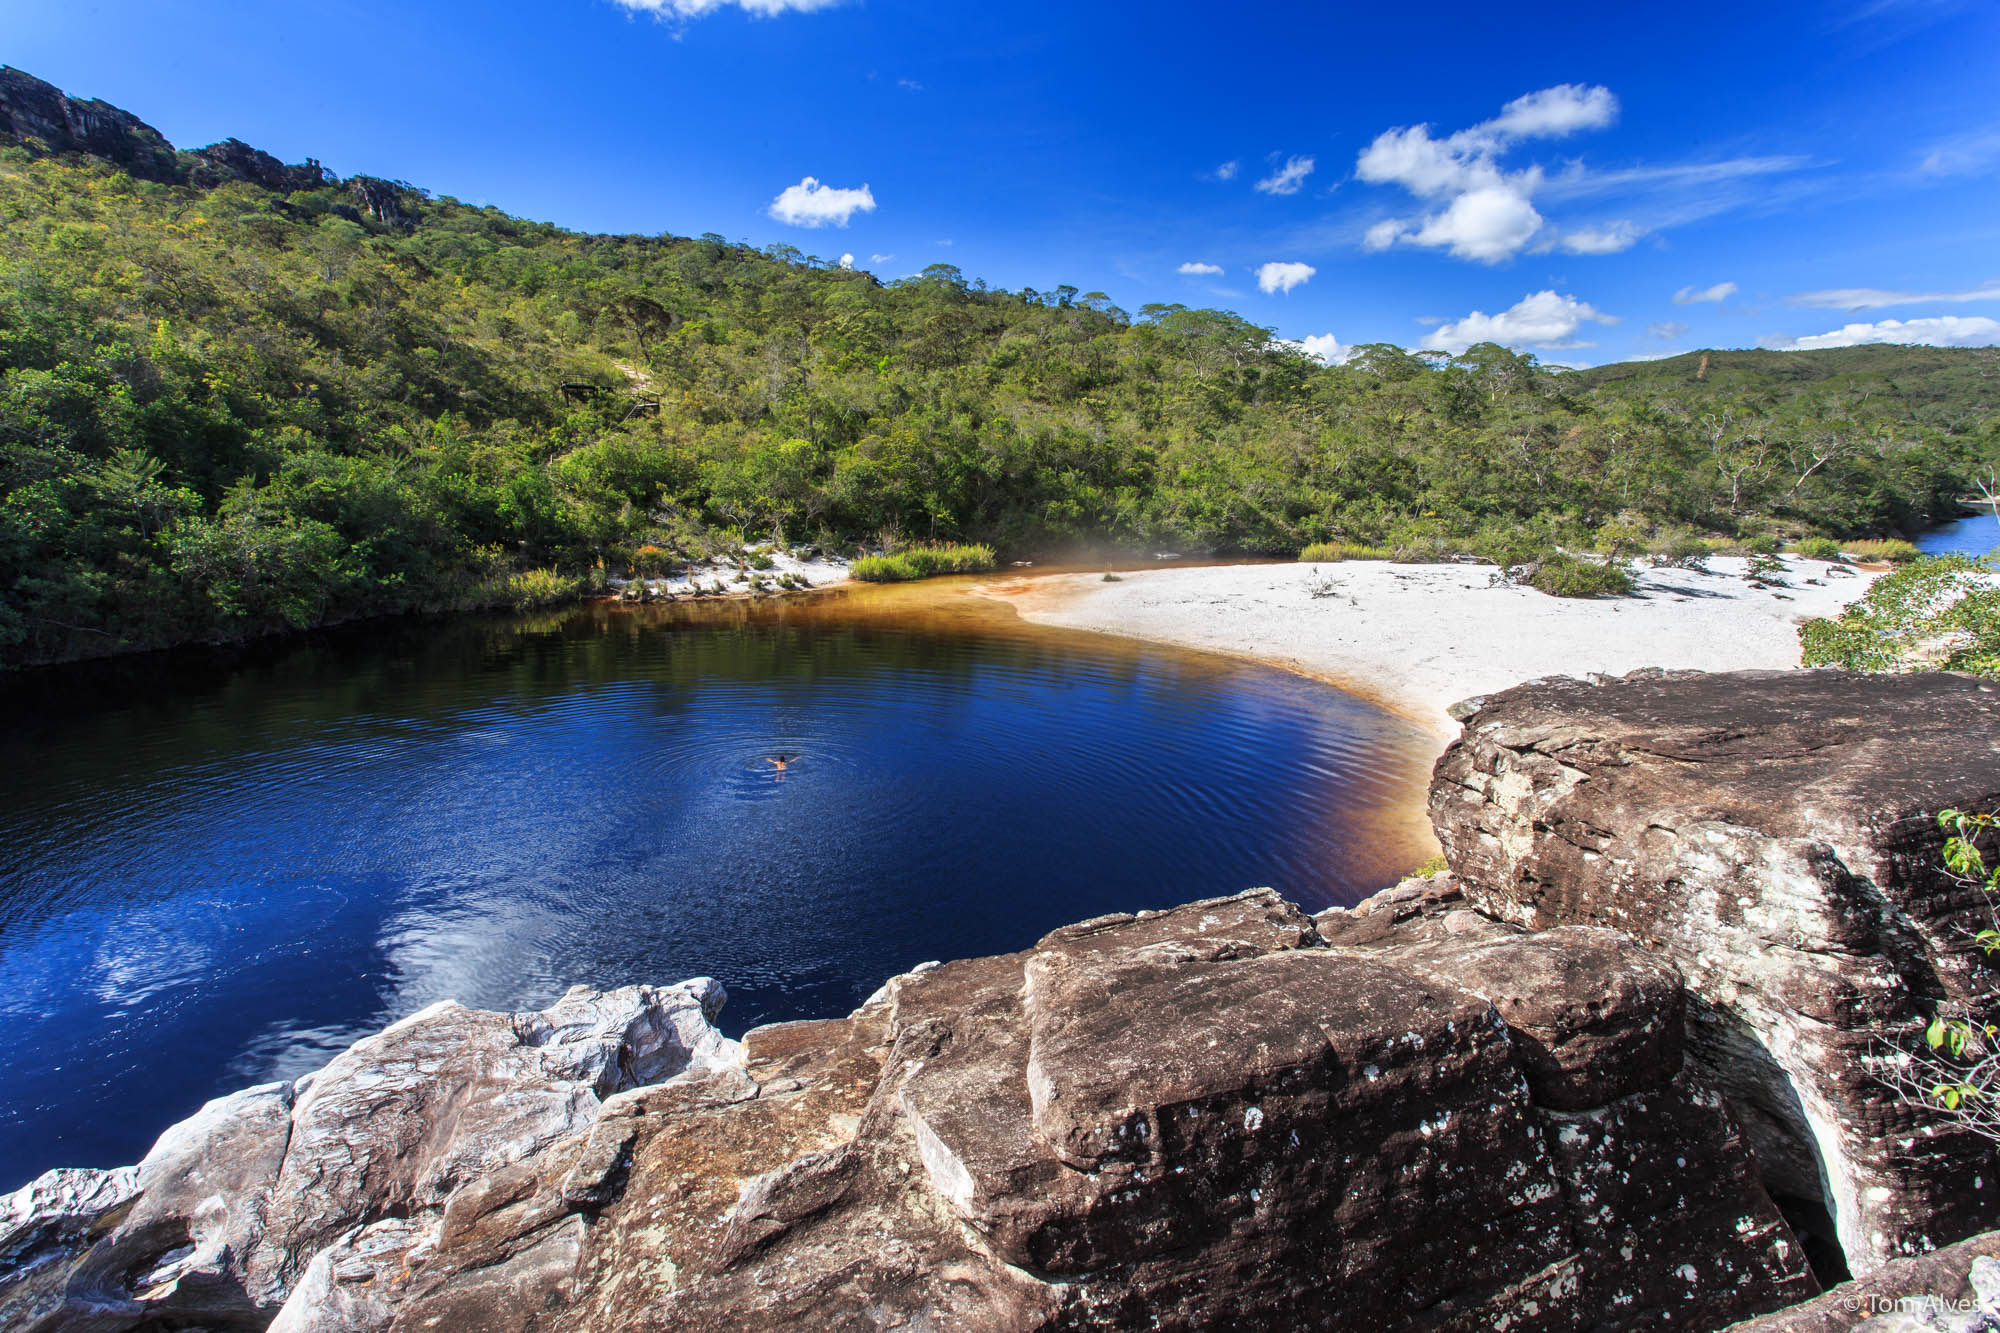 parque estadual do rio preto-mg